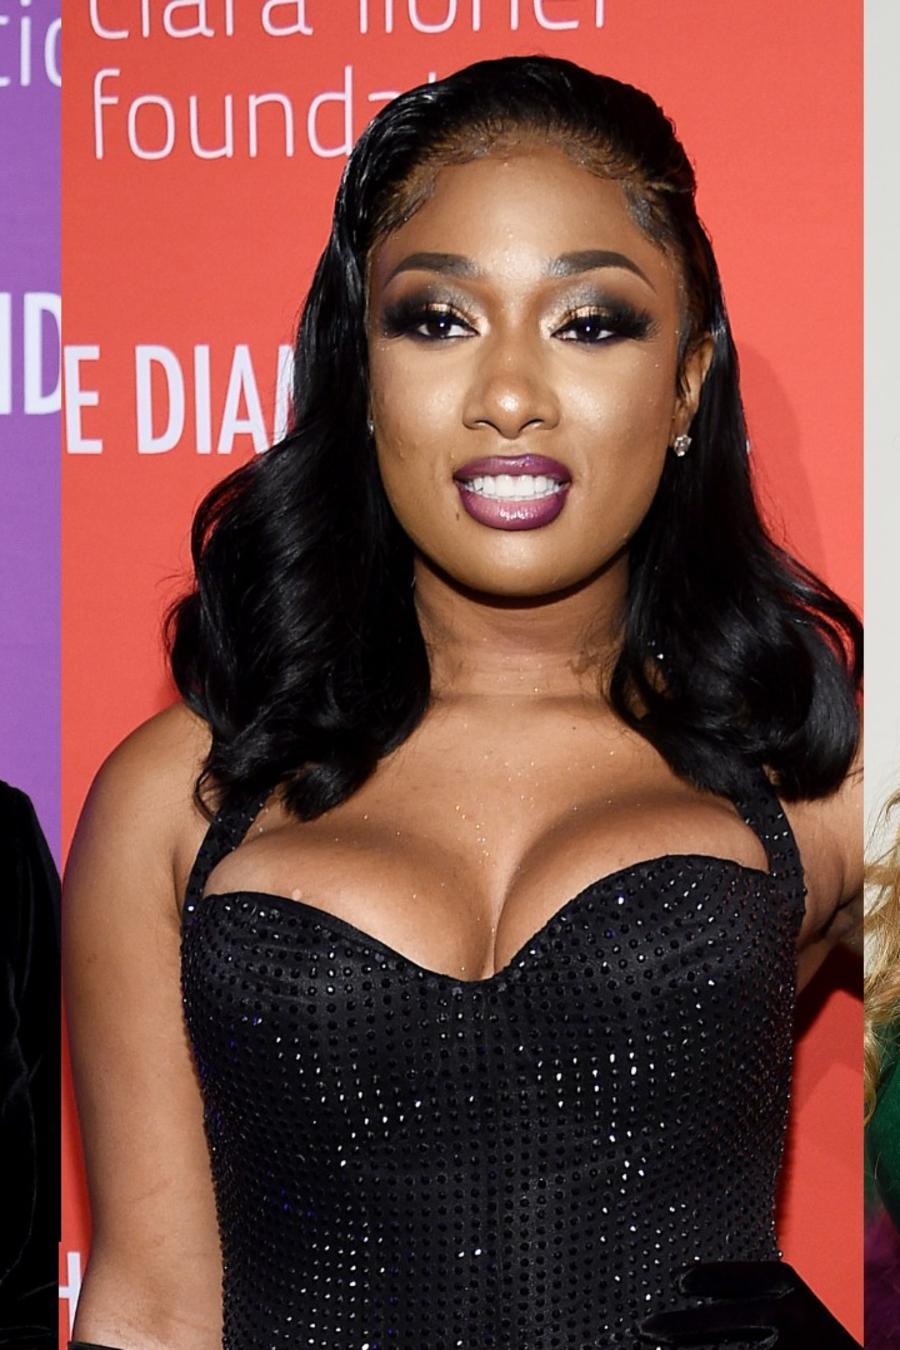 Rihanna, Megan Thee Stallion, Beyoncé